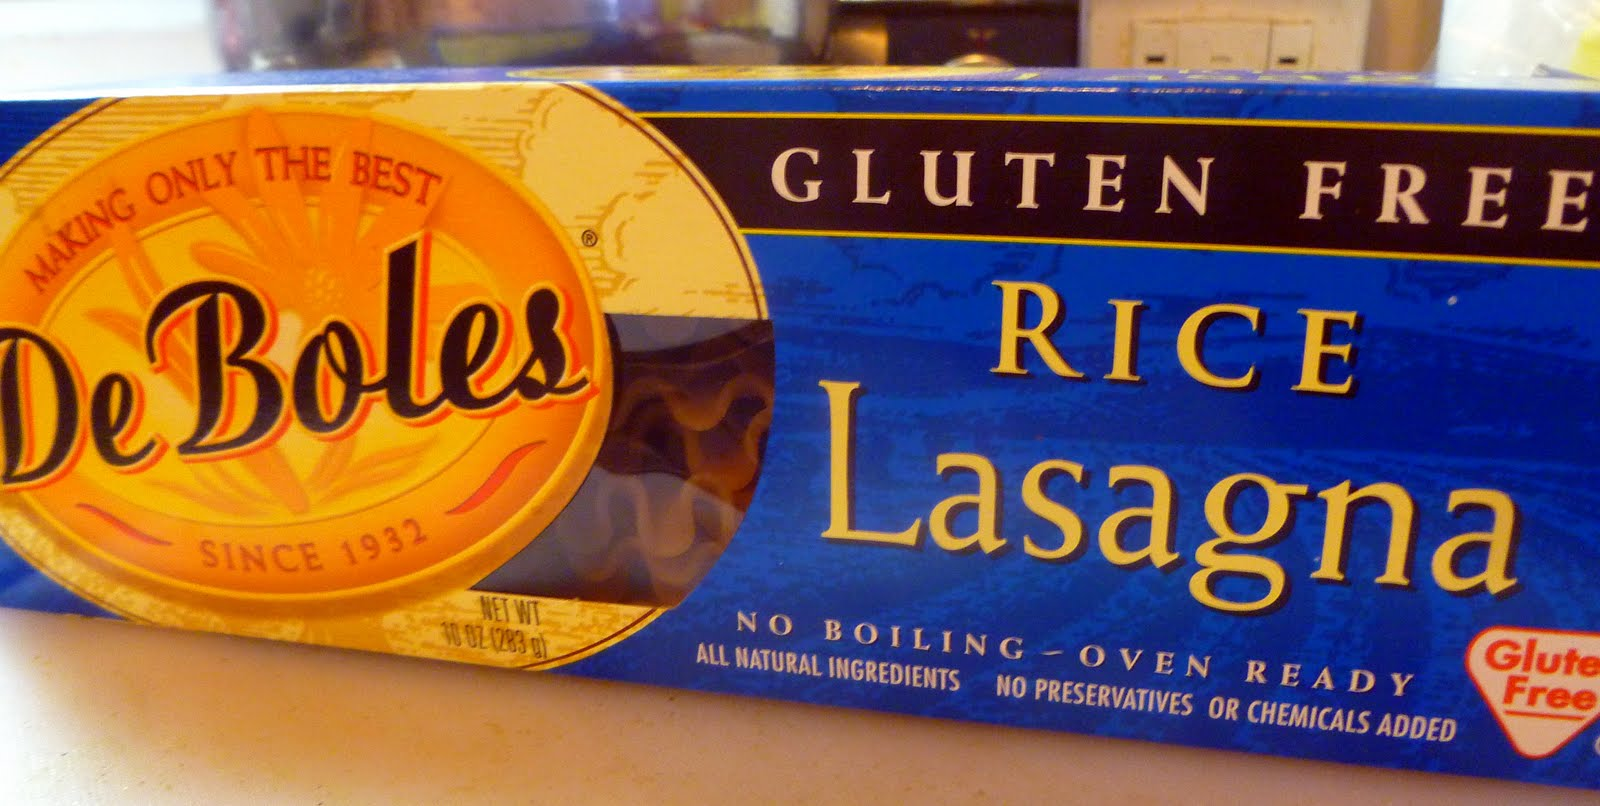 JeanC Reviews...: De Boles Gluten Free Rice Lasagna Noodles (no boil)